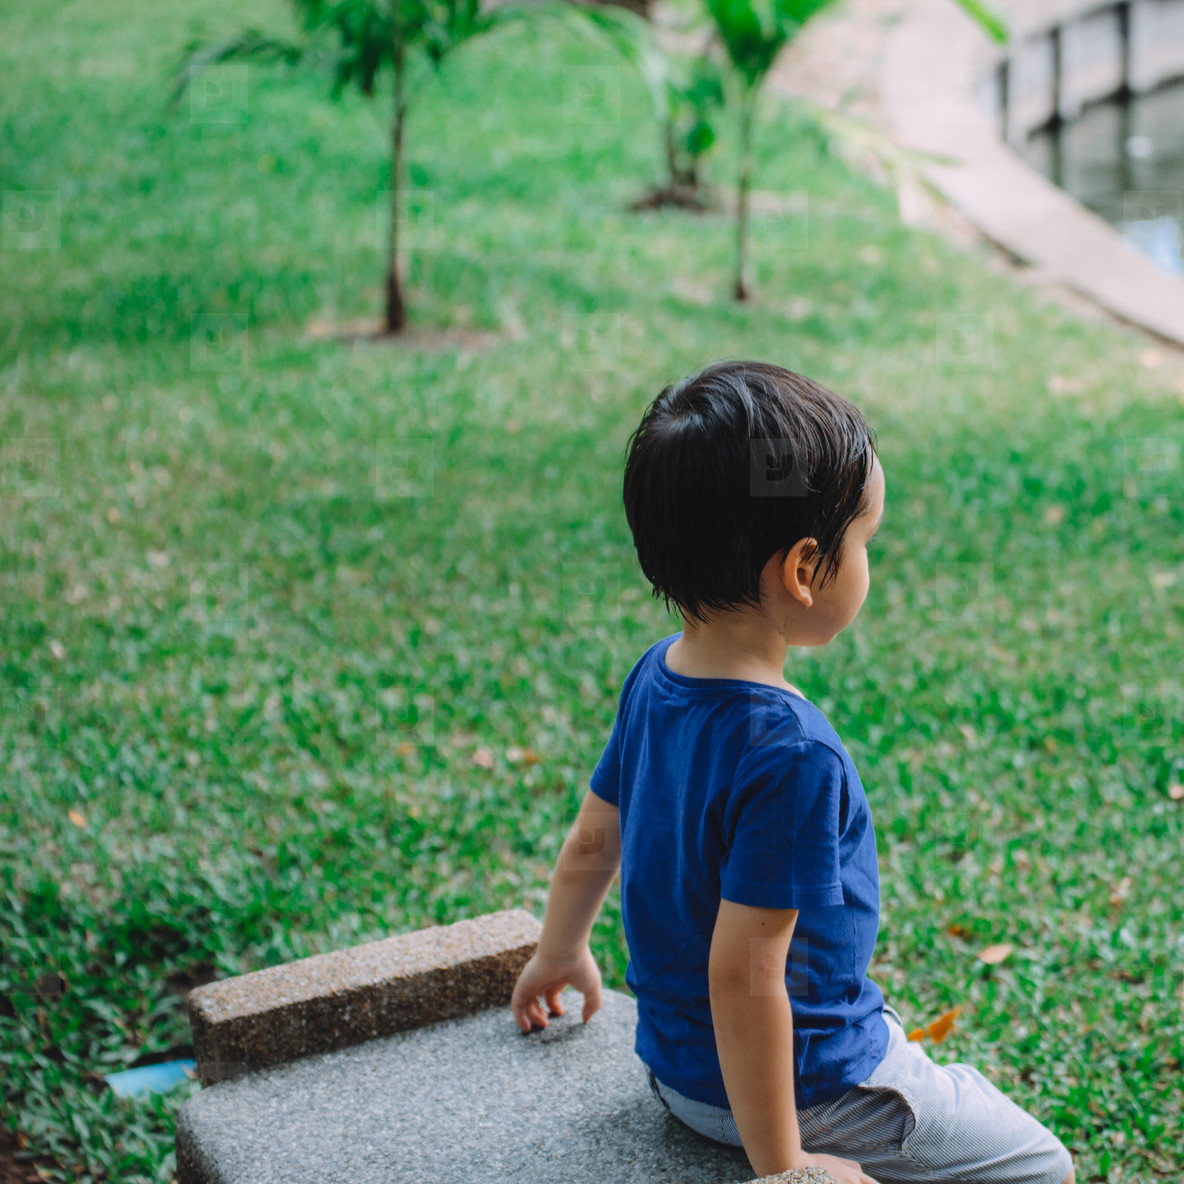 Boy Sitting in Park